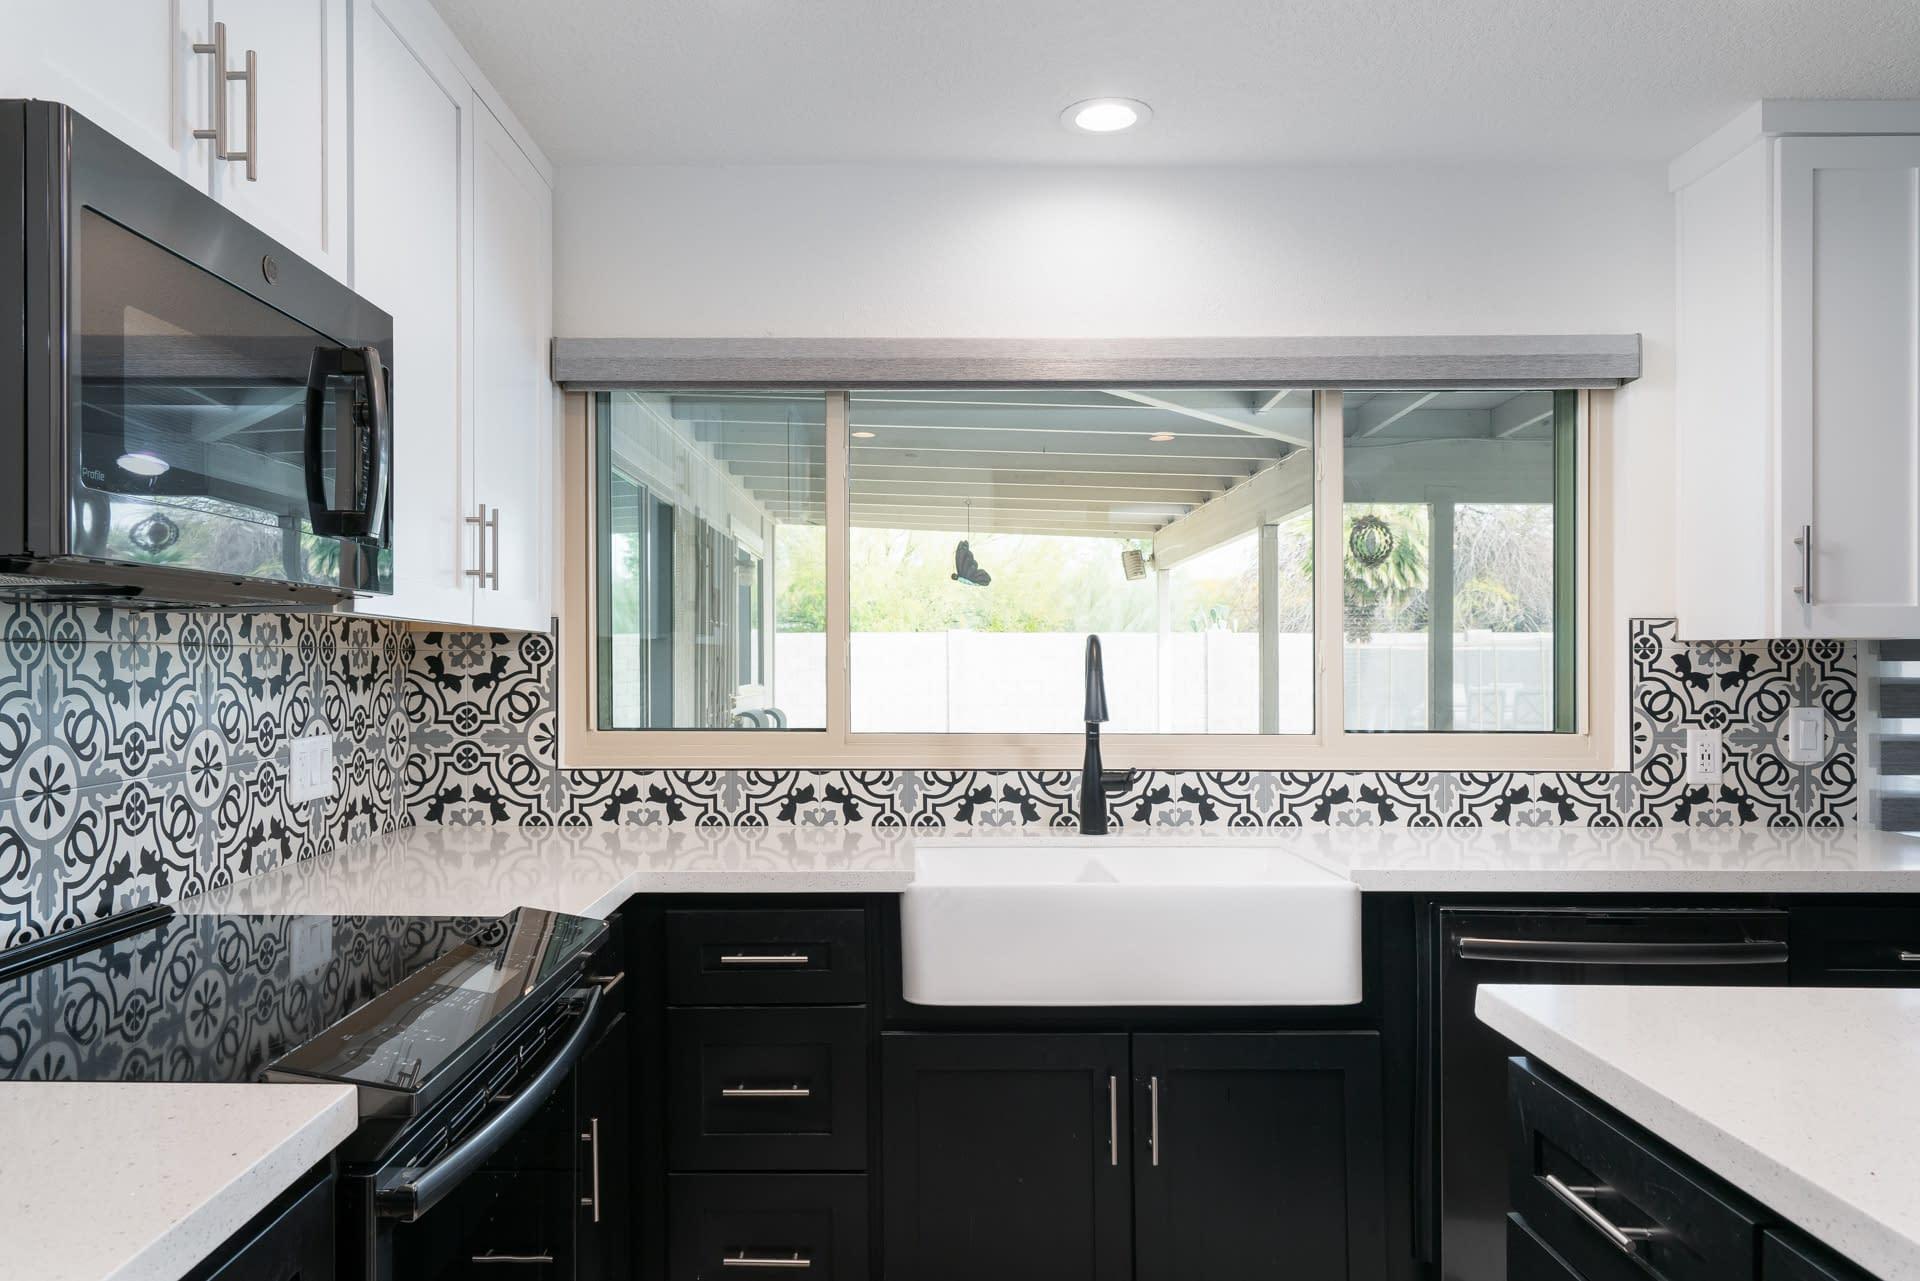 Kitchen remodel Chandler after photo